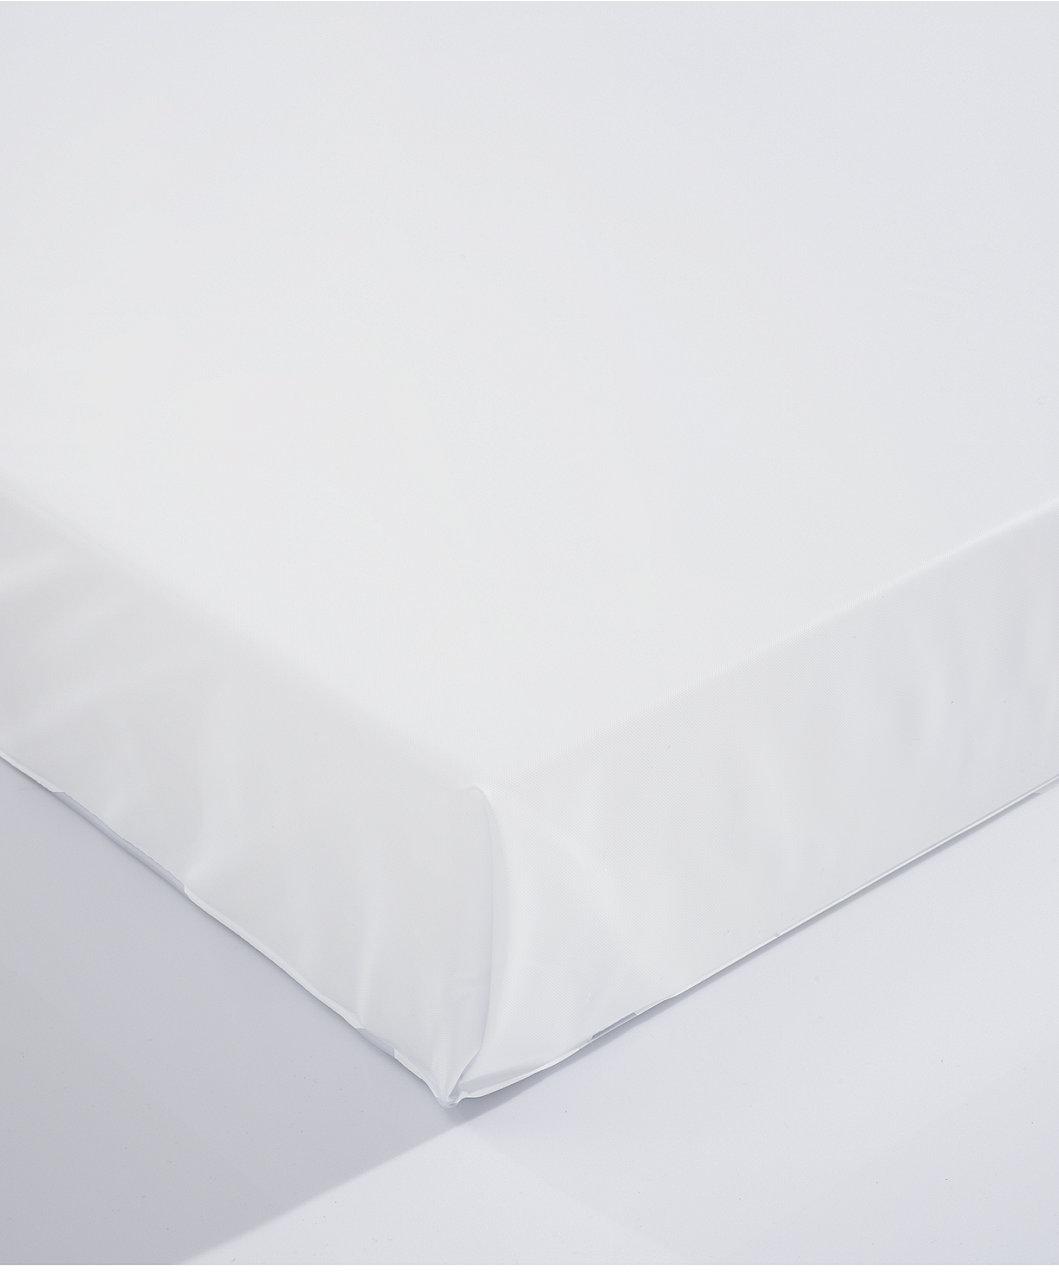 Mothercare Essential Foam Waterproof Cot Mattress